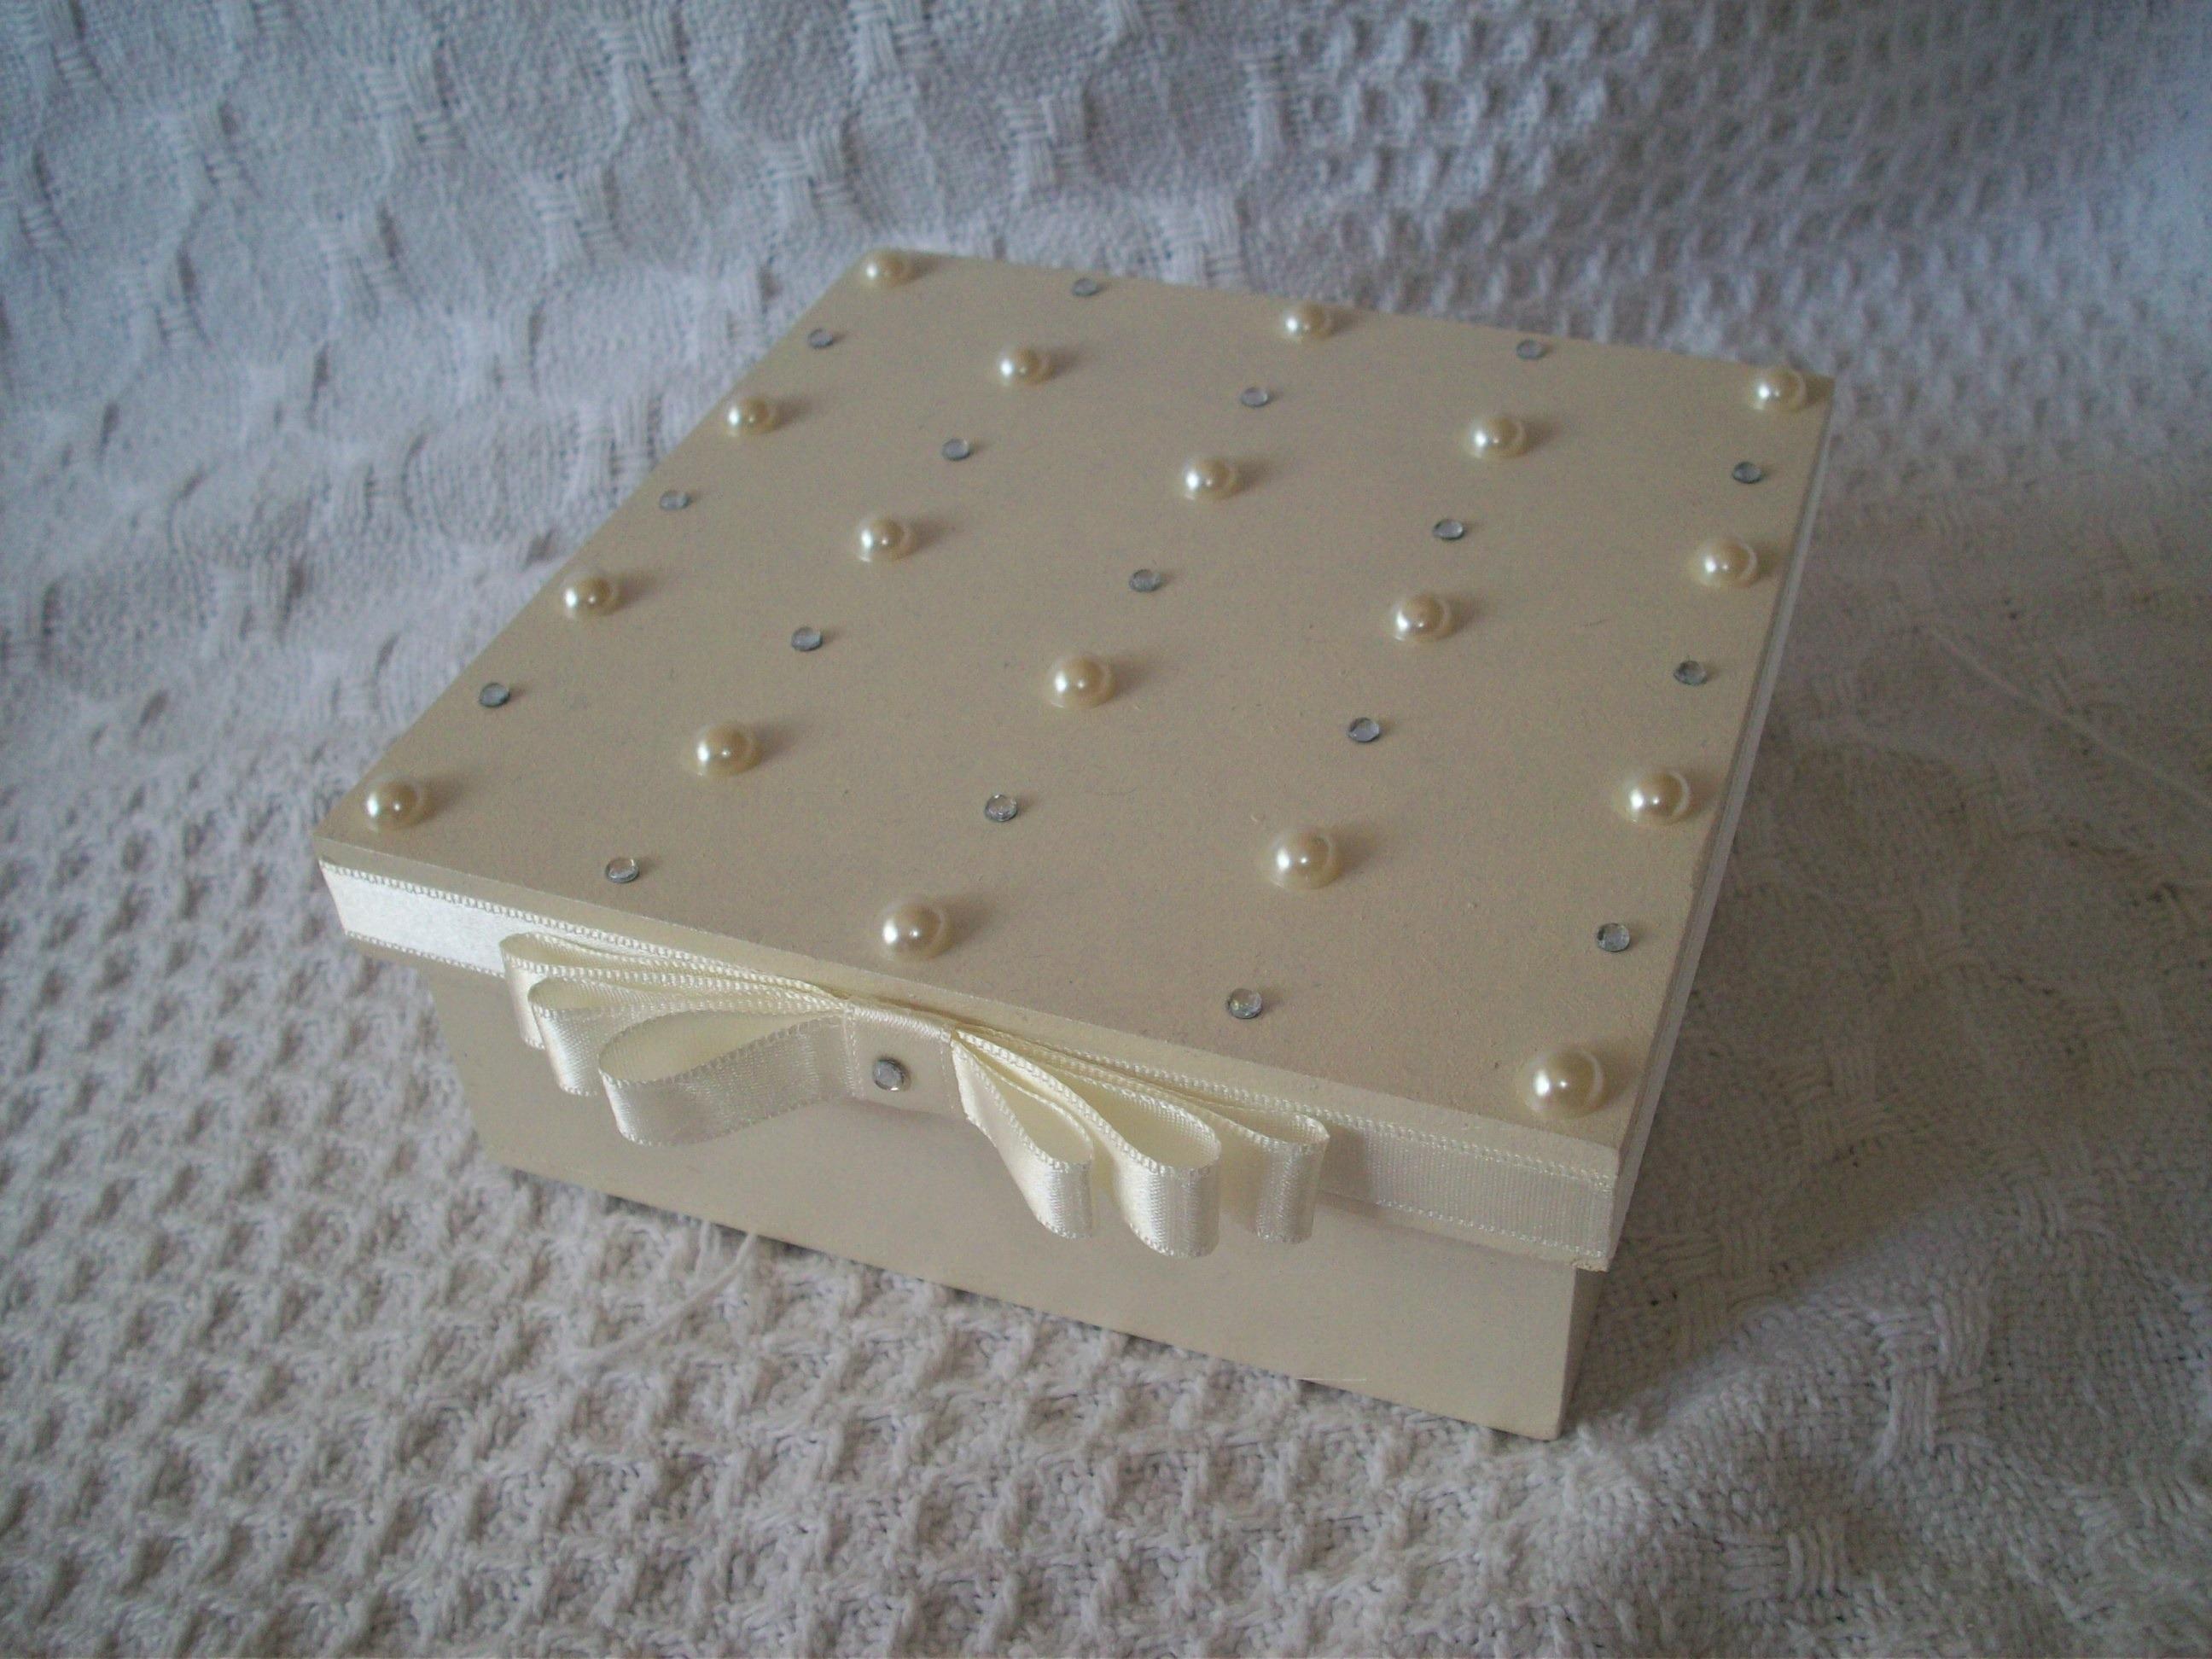 caixa perola e strass caixa perola e strass #756E56 2592x1944